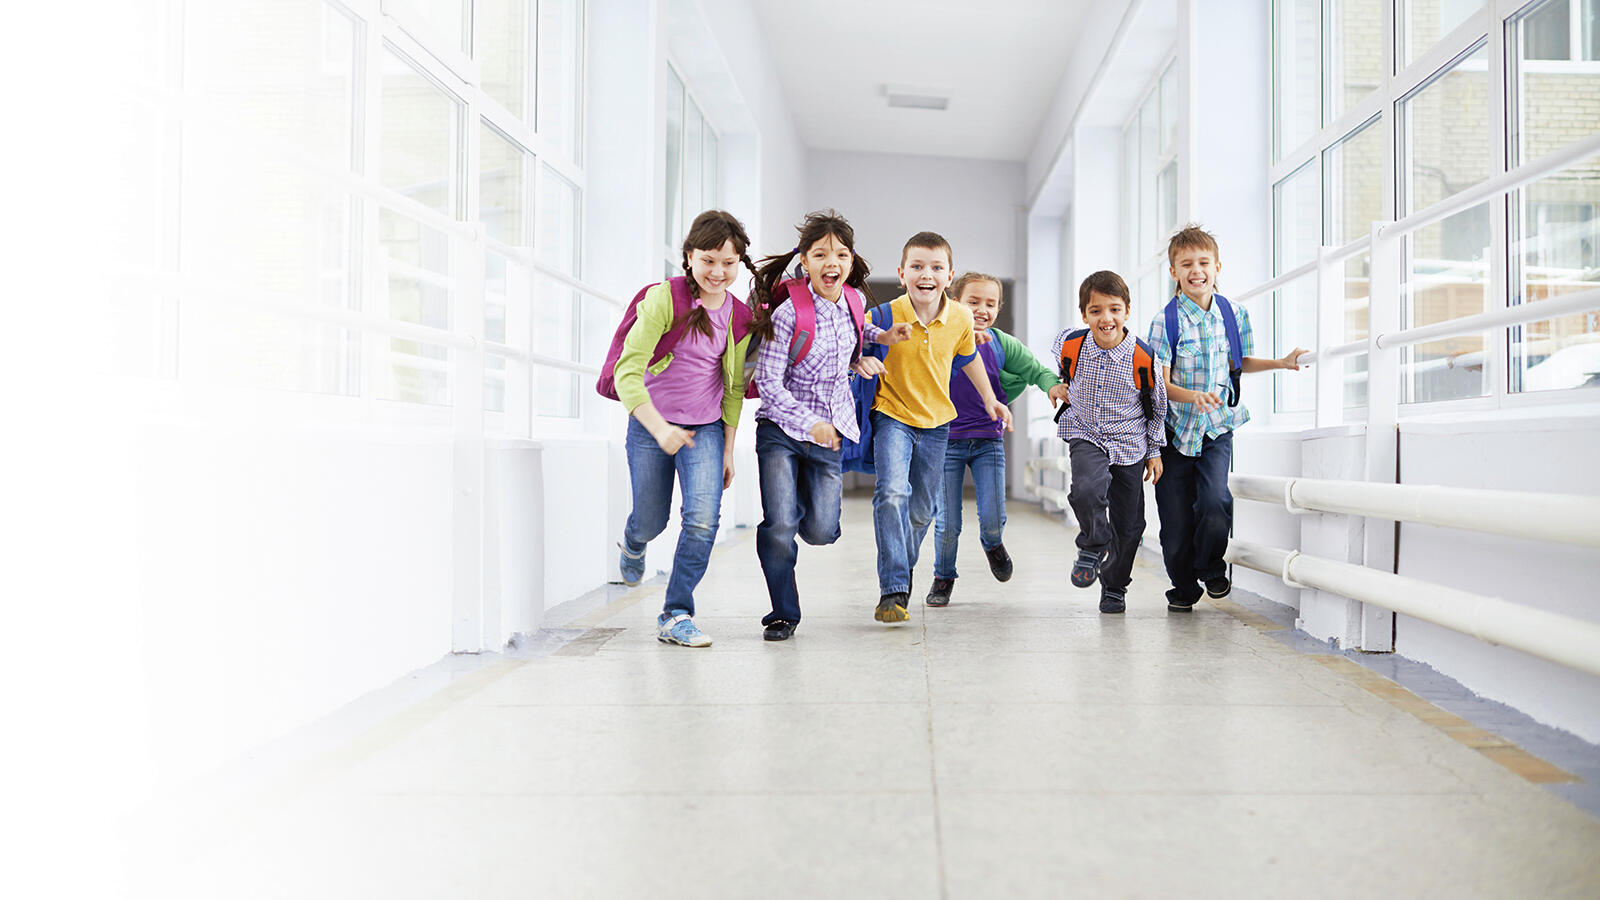 uk_back_to_school_parent_teacher_guide.jpg